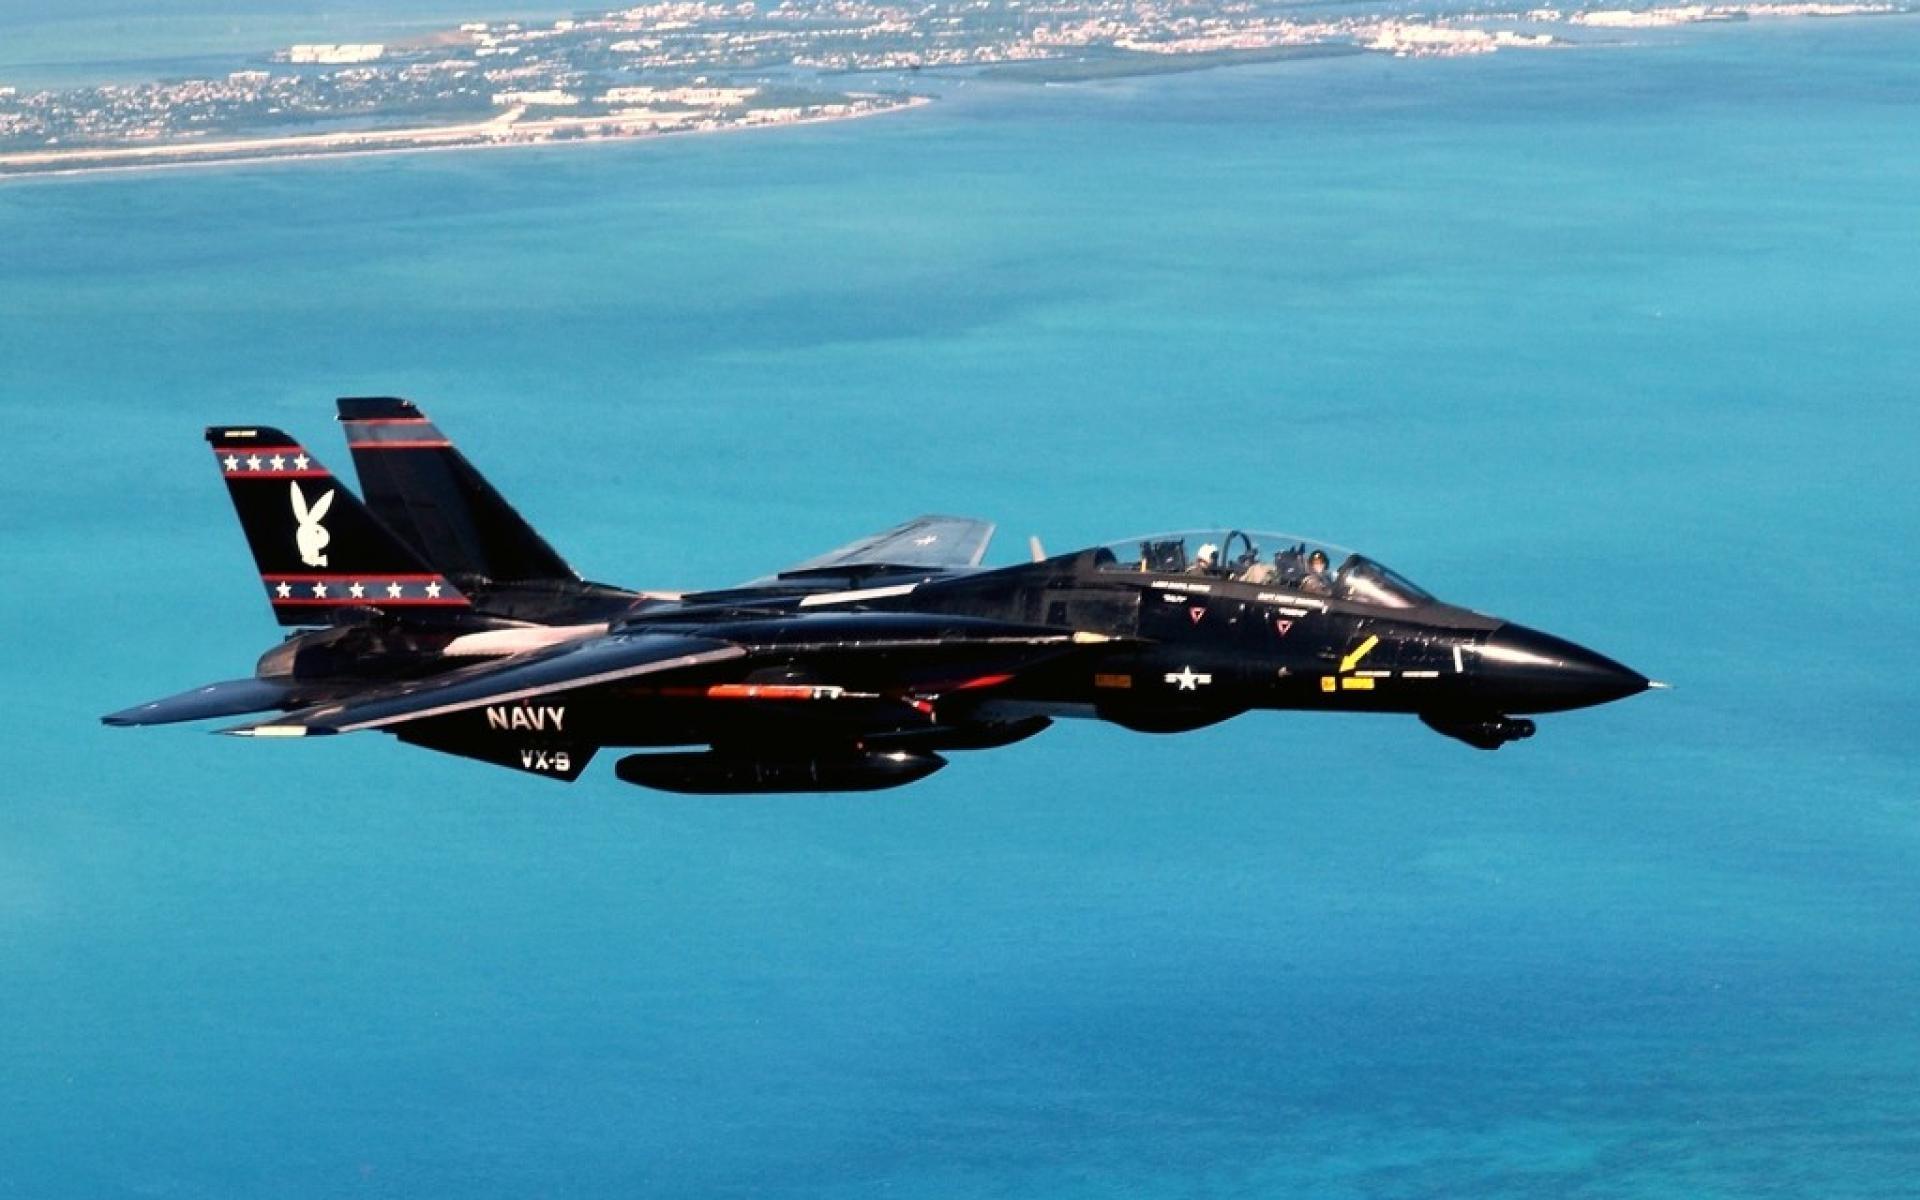 F 14 Tomcat Images & Pictures